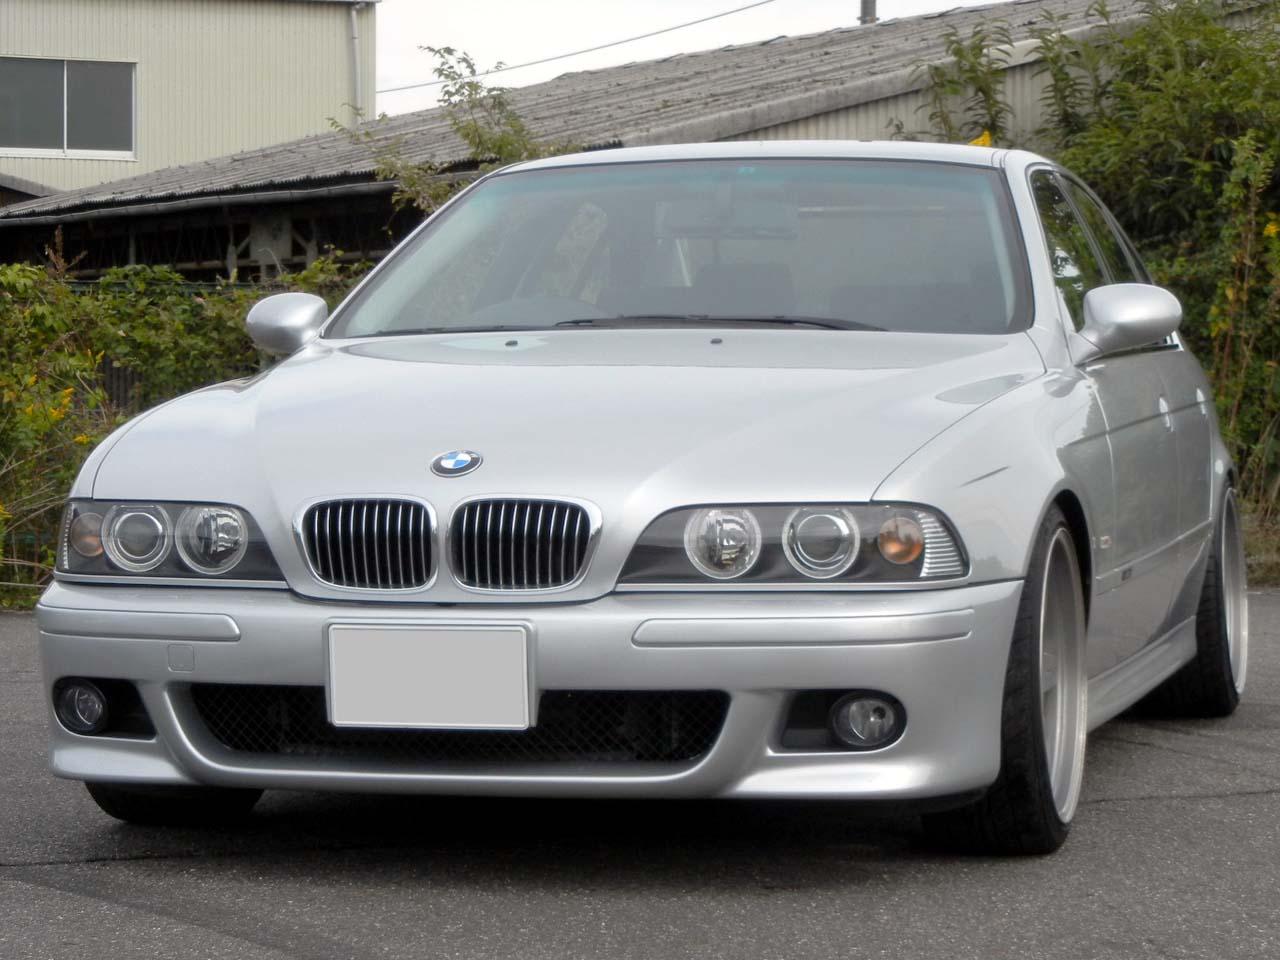 BMW・5シリーズの画像 p1_38